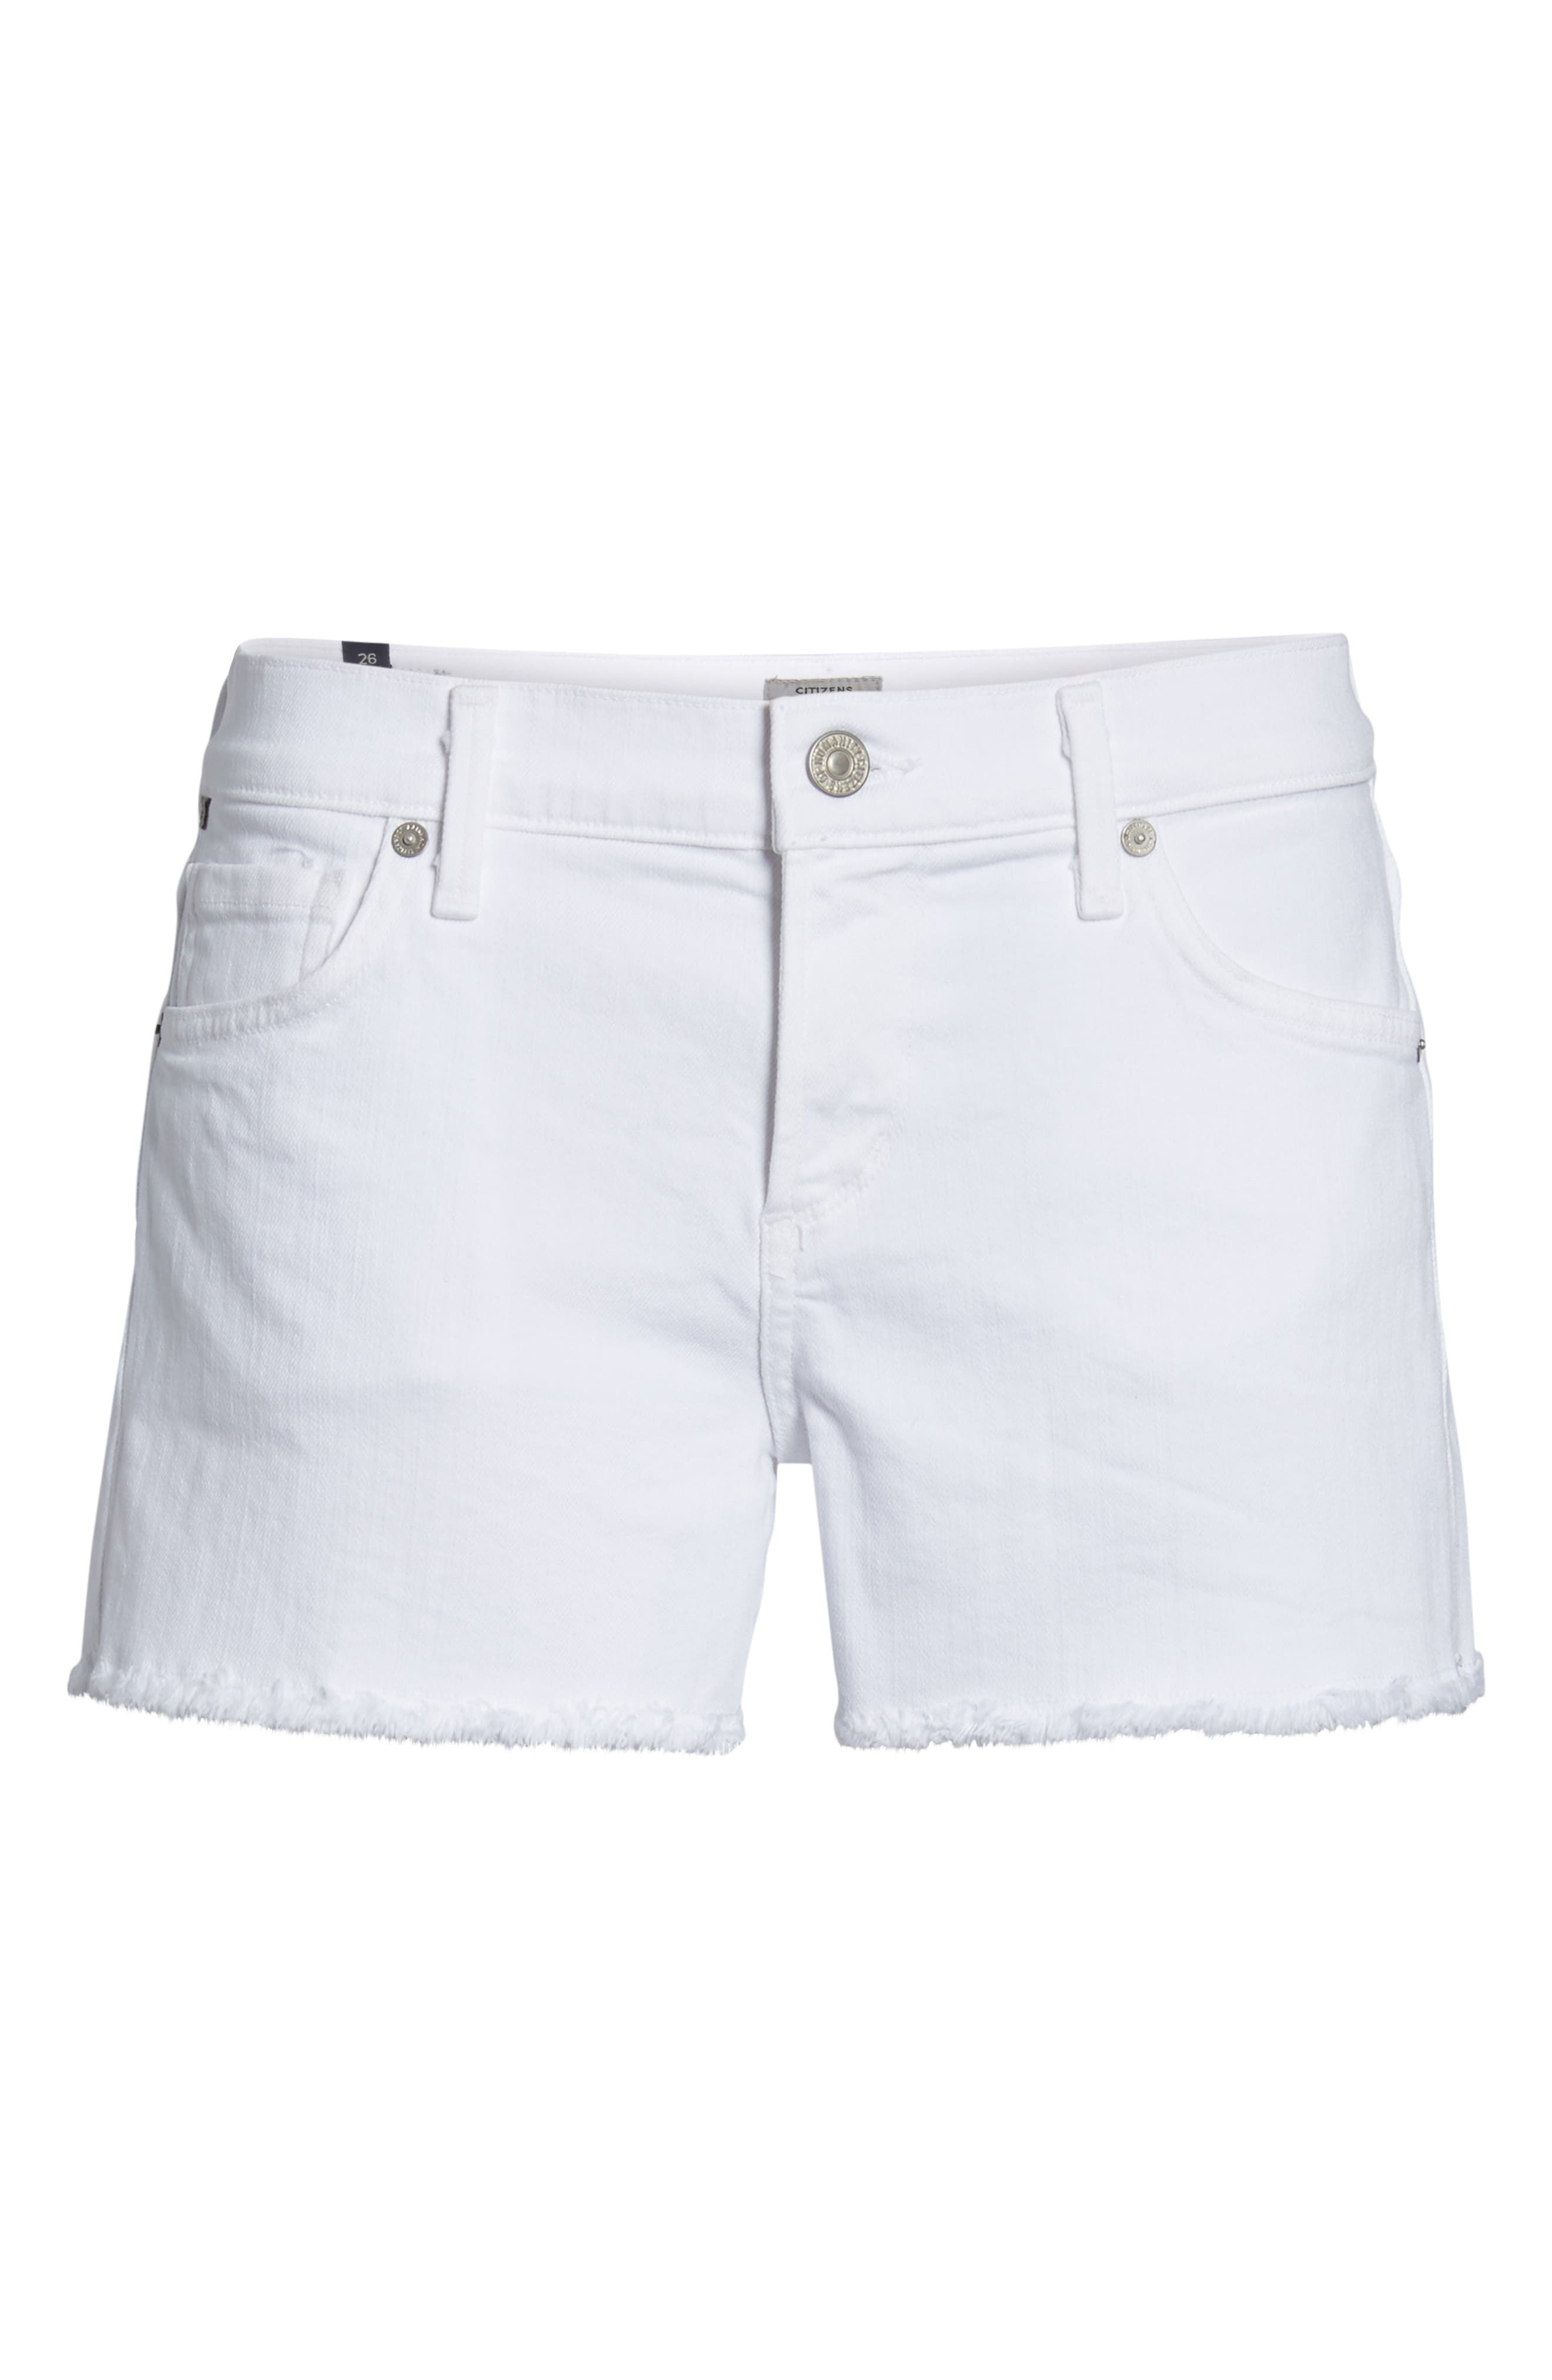 Ava Cutoff Denim Shorts,                             Alternate thumbnail 7, color,                             Optic White